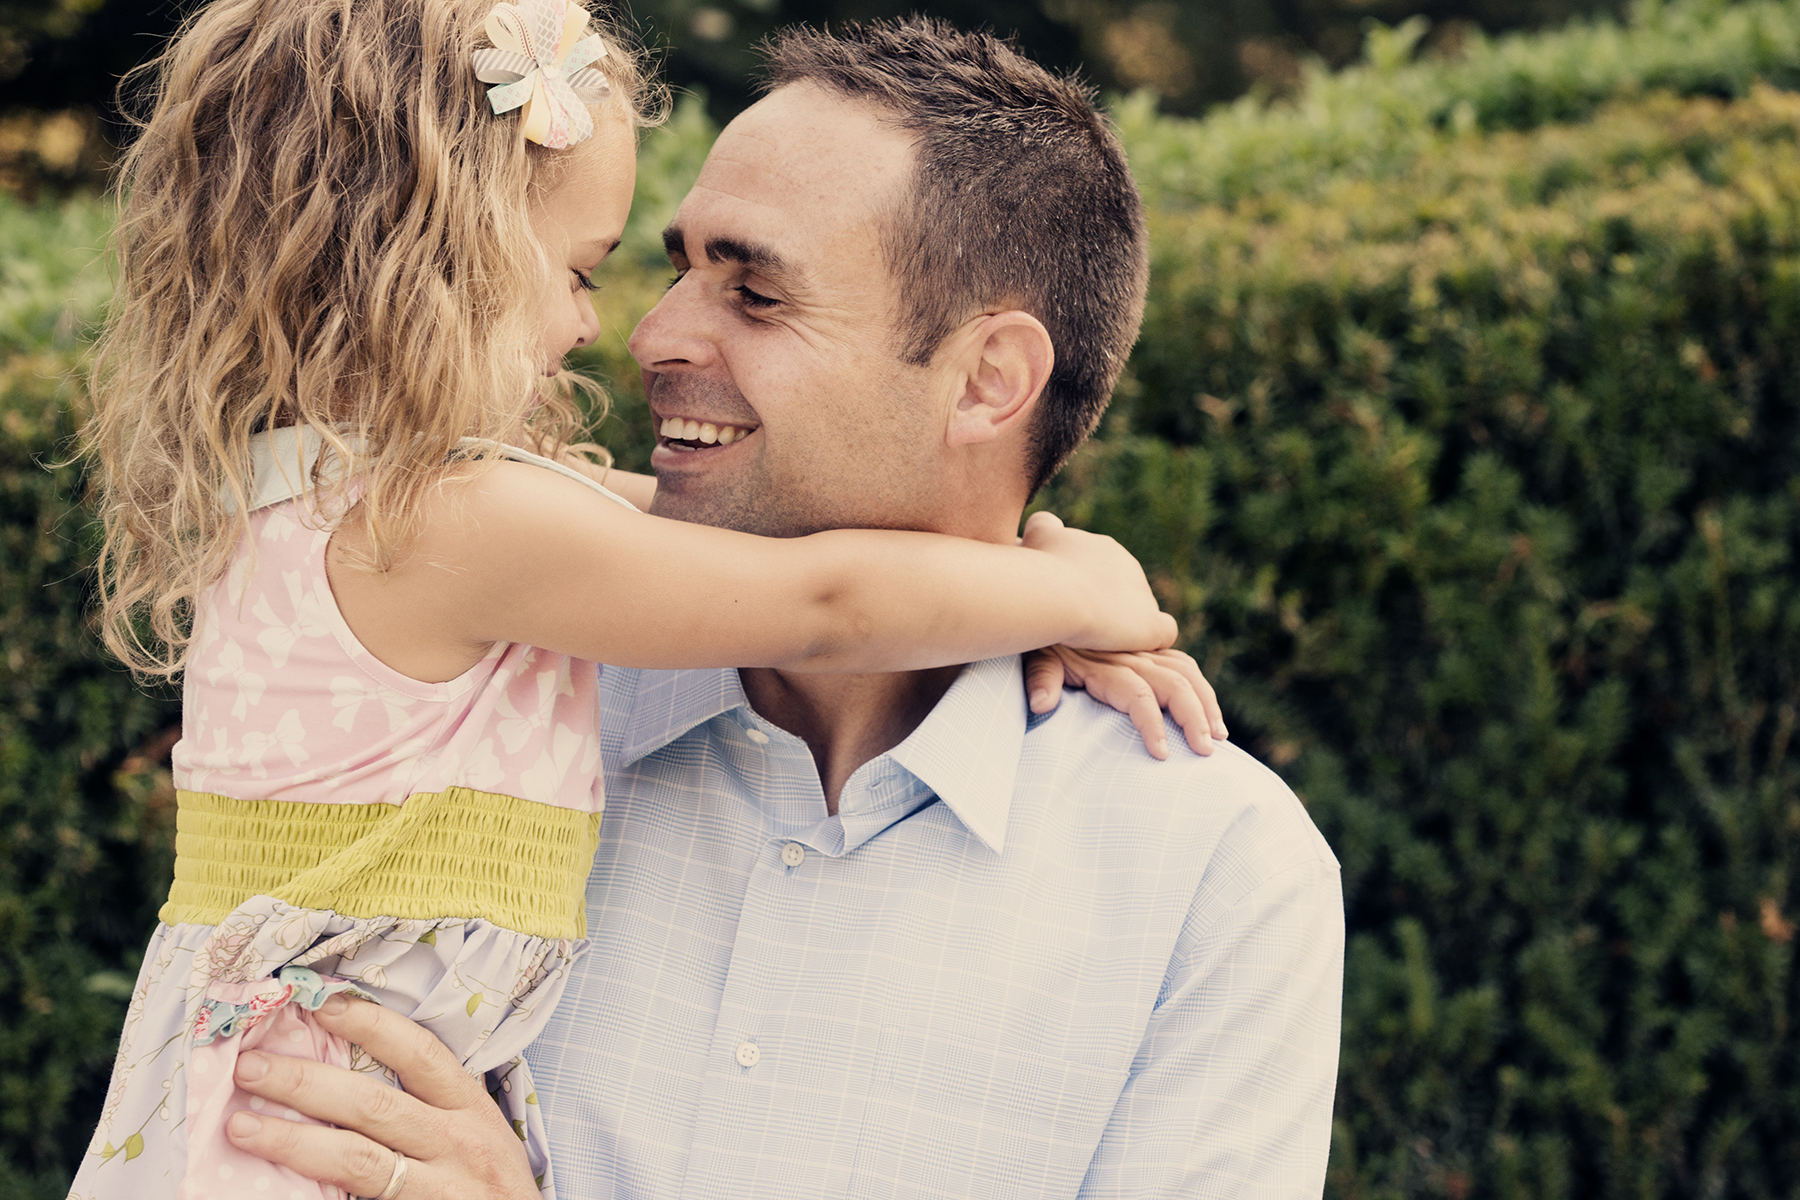 Utah Family Photos daddy daughter smile love